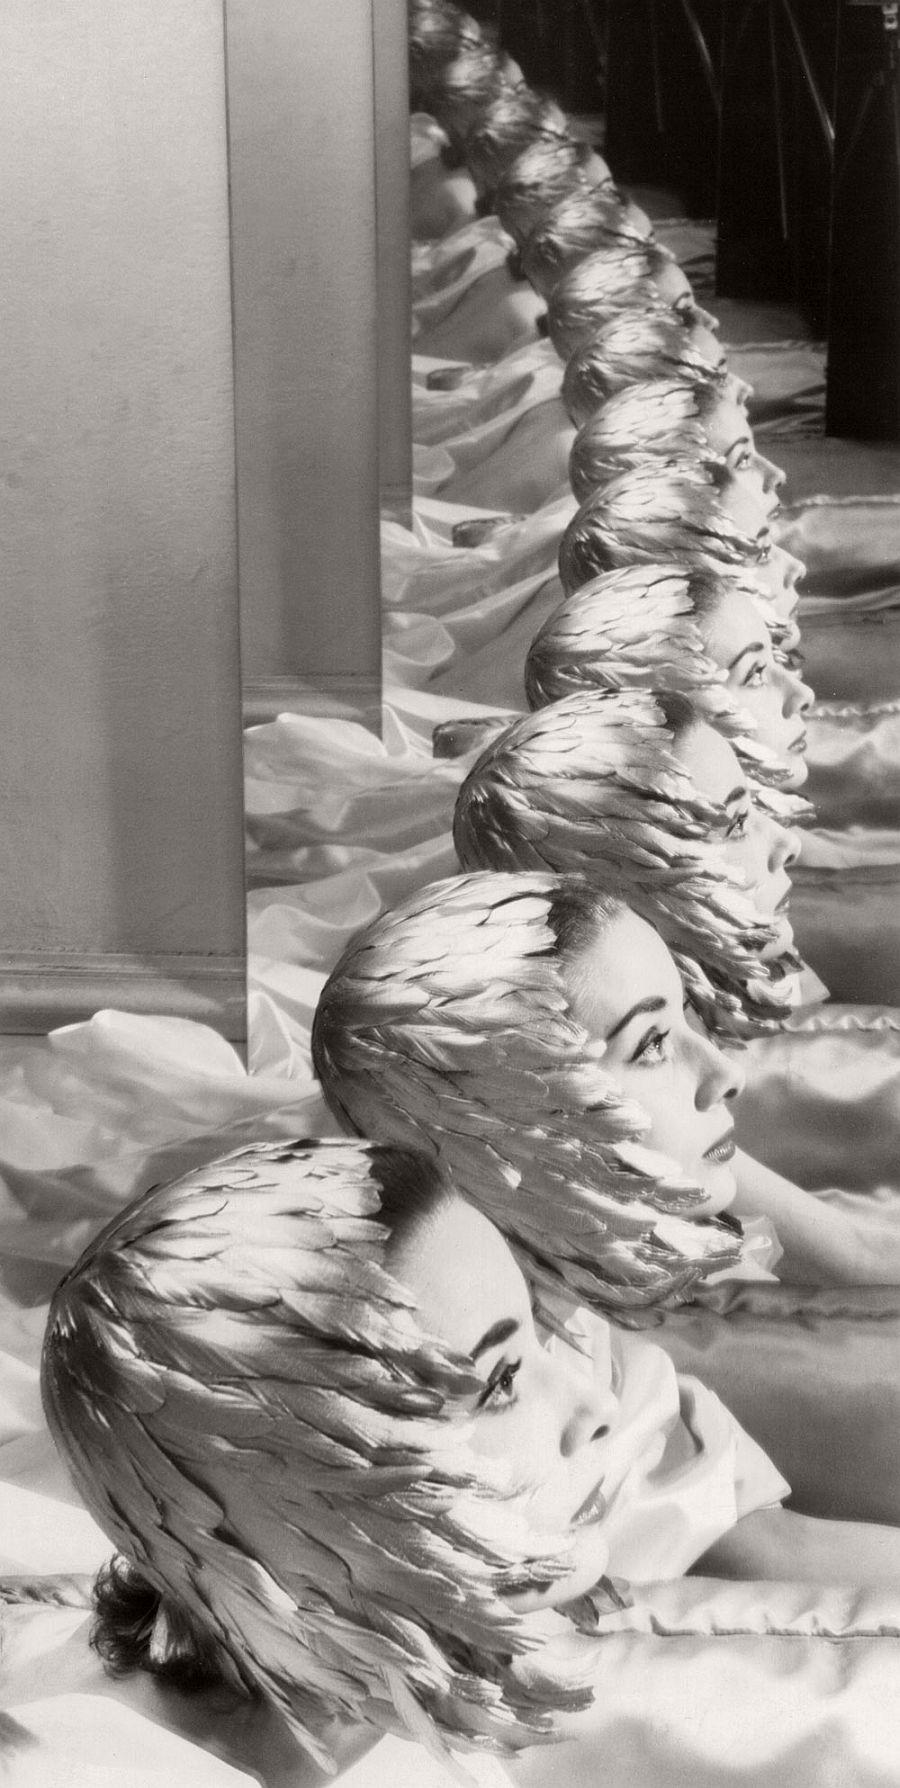 Erwin Blumenfeld Audrey Hepburn New York, 1950